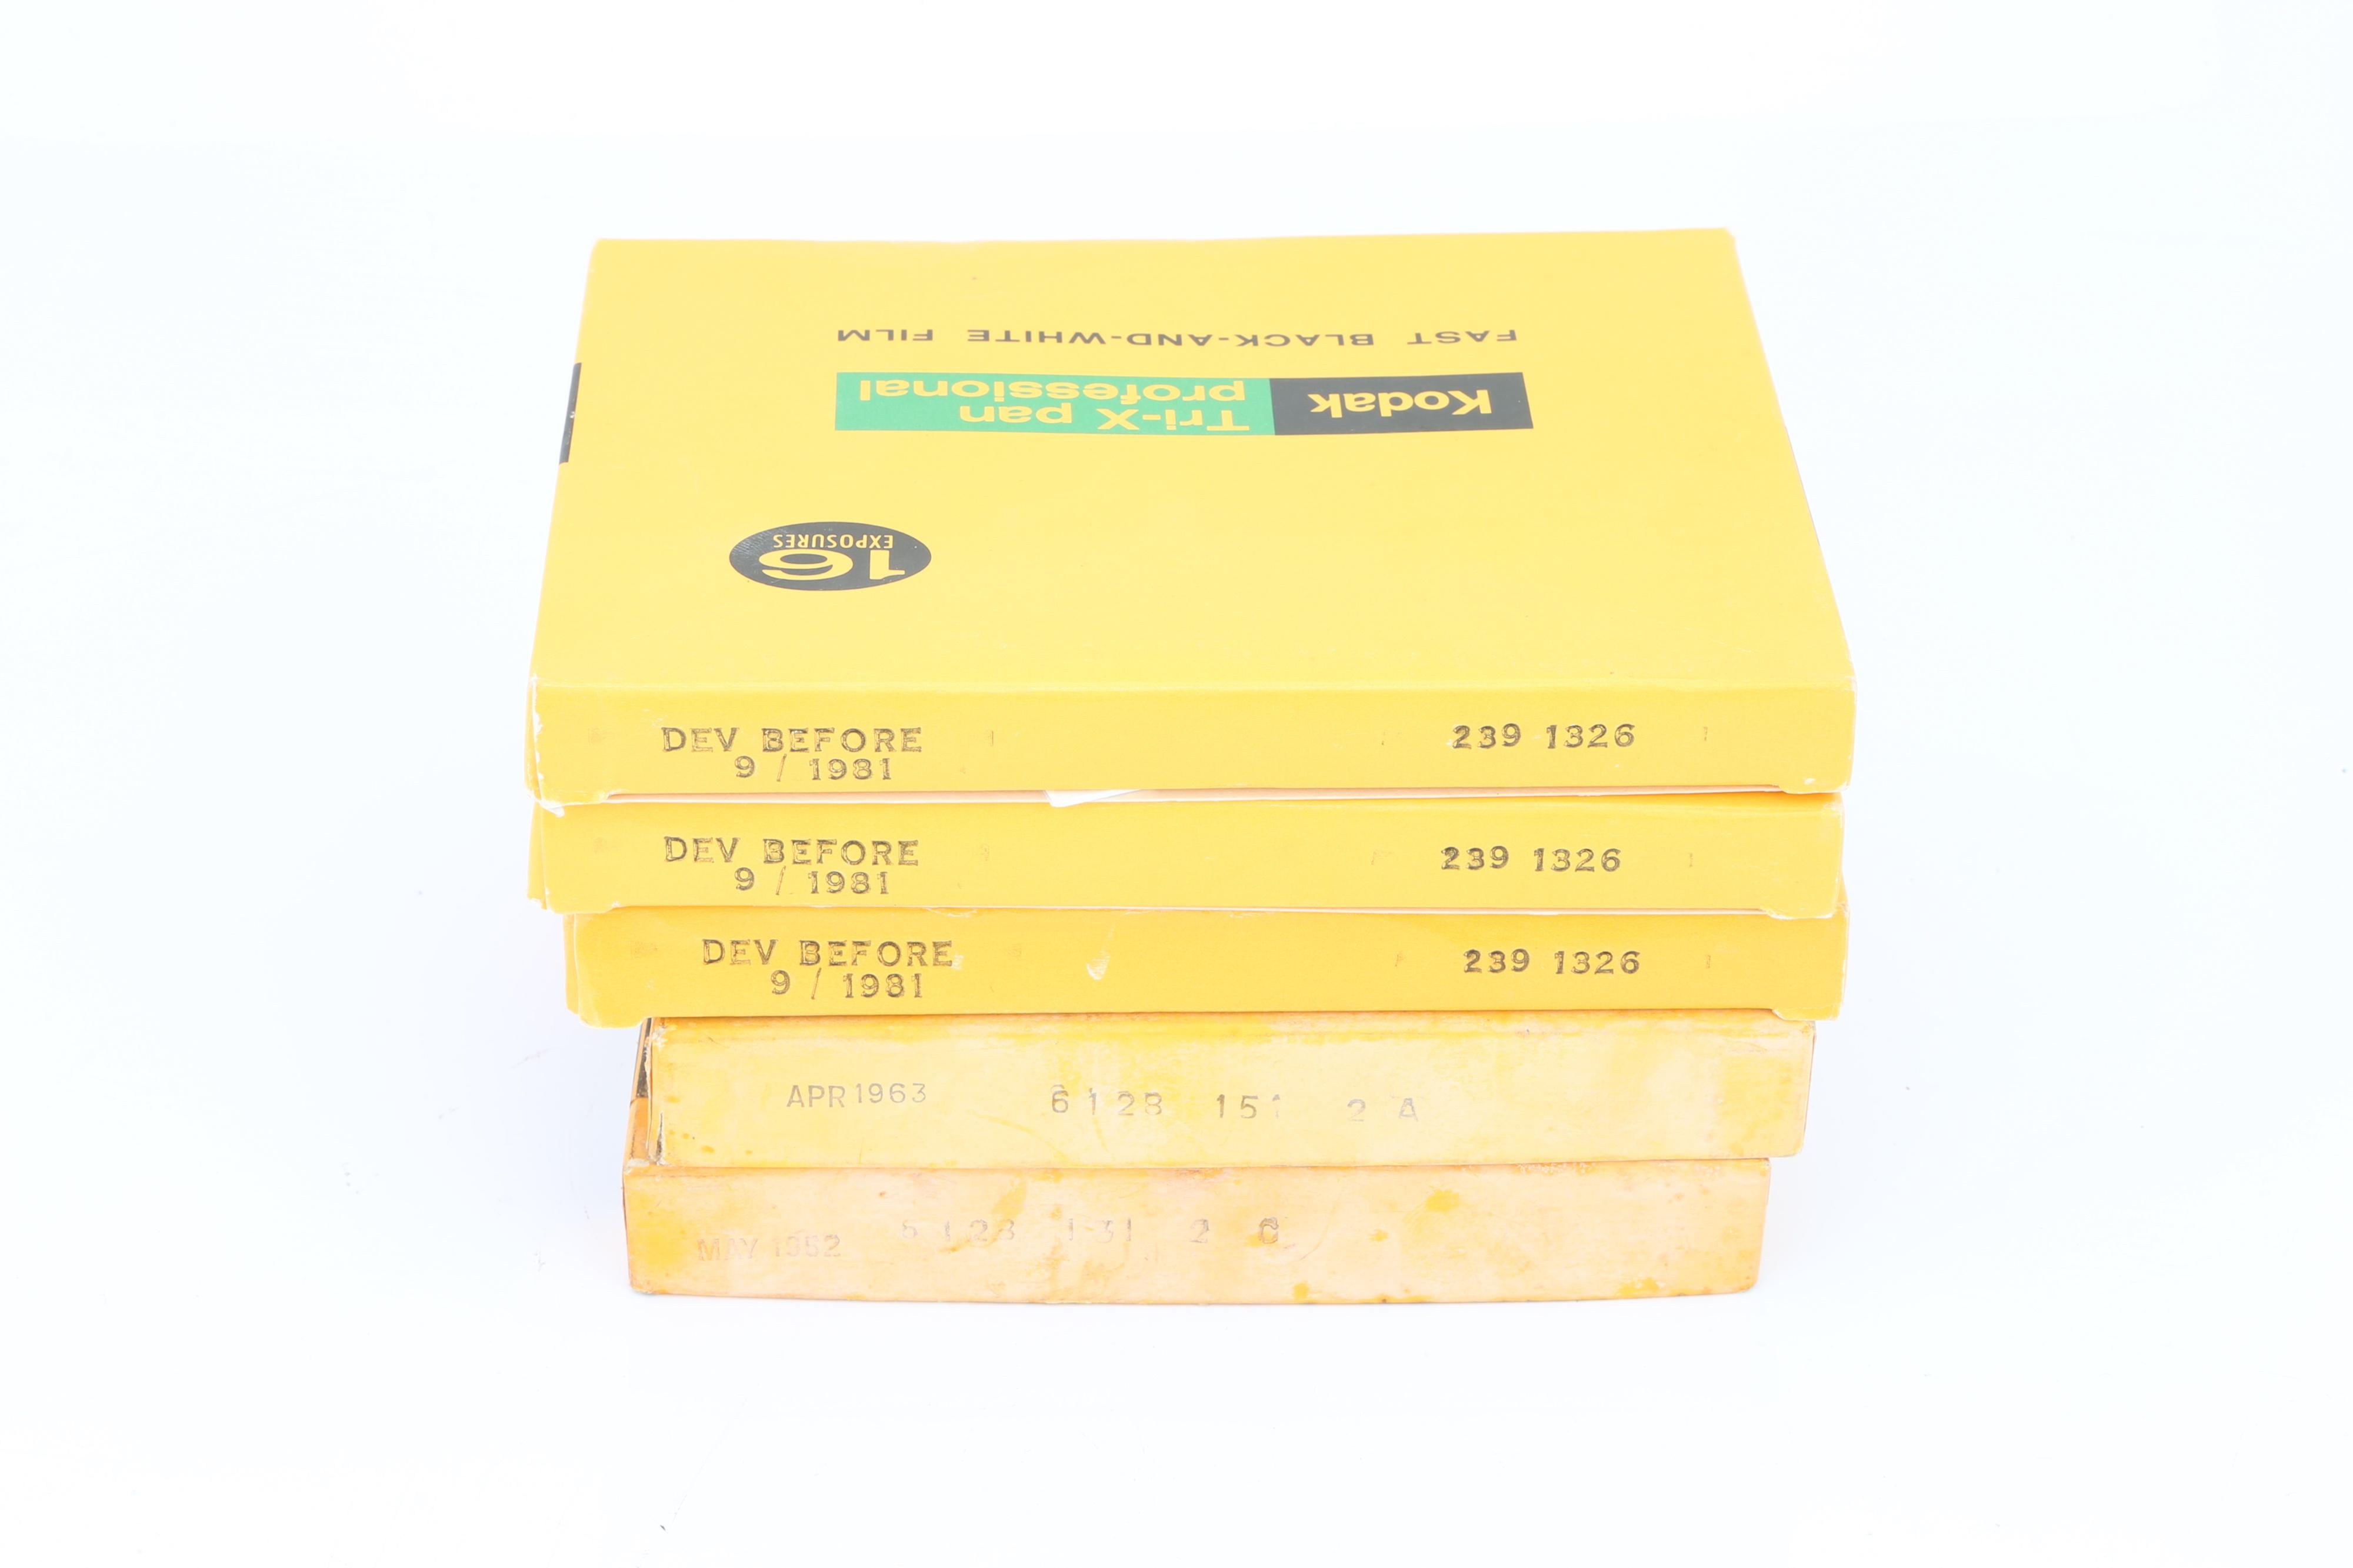 Five BOxes of Kodak 4x5' Sheet Film, - Image 2 of 2